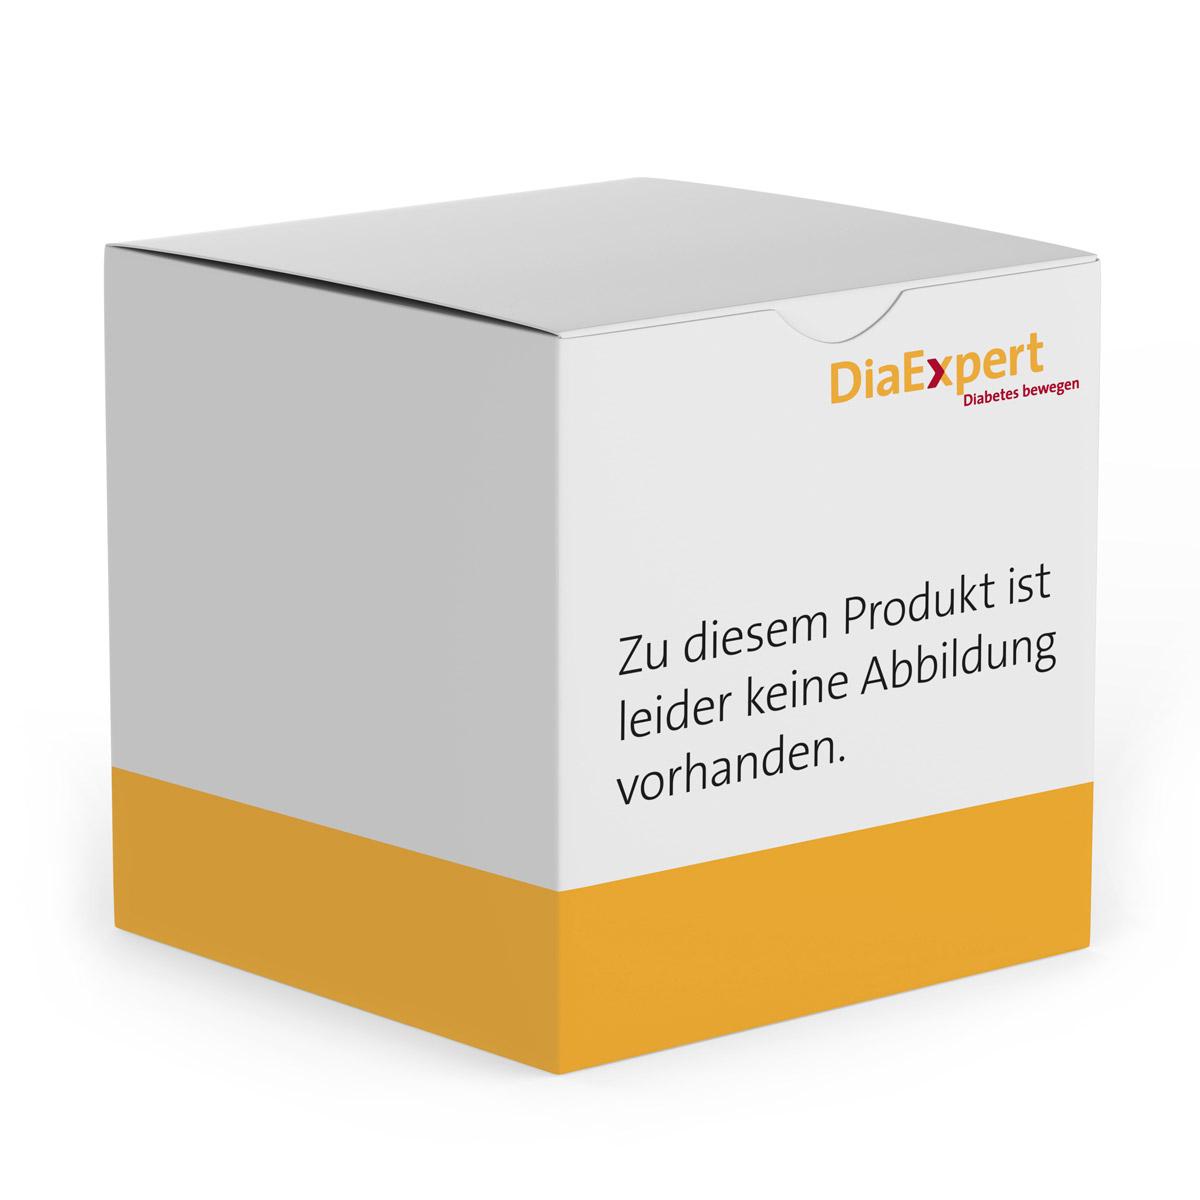 Accu-Chek Insight Batteriefachabdeckung 1 Stück inkl. Batterien